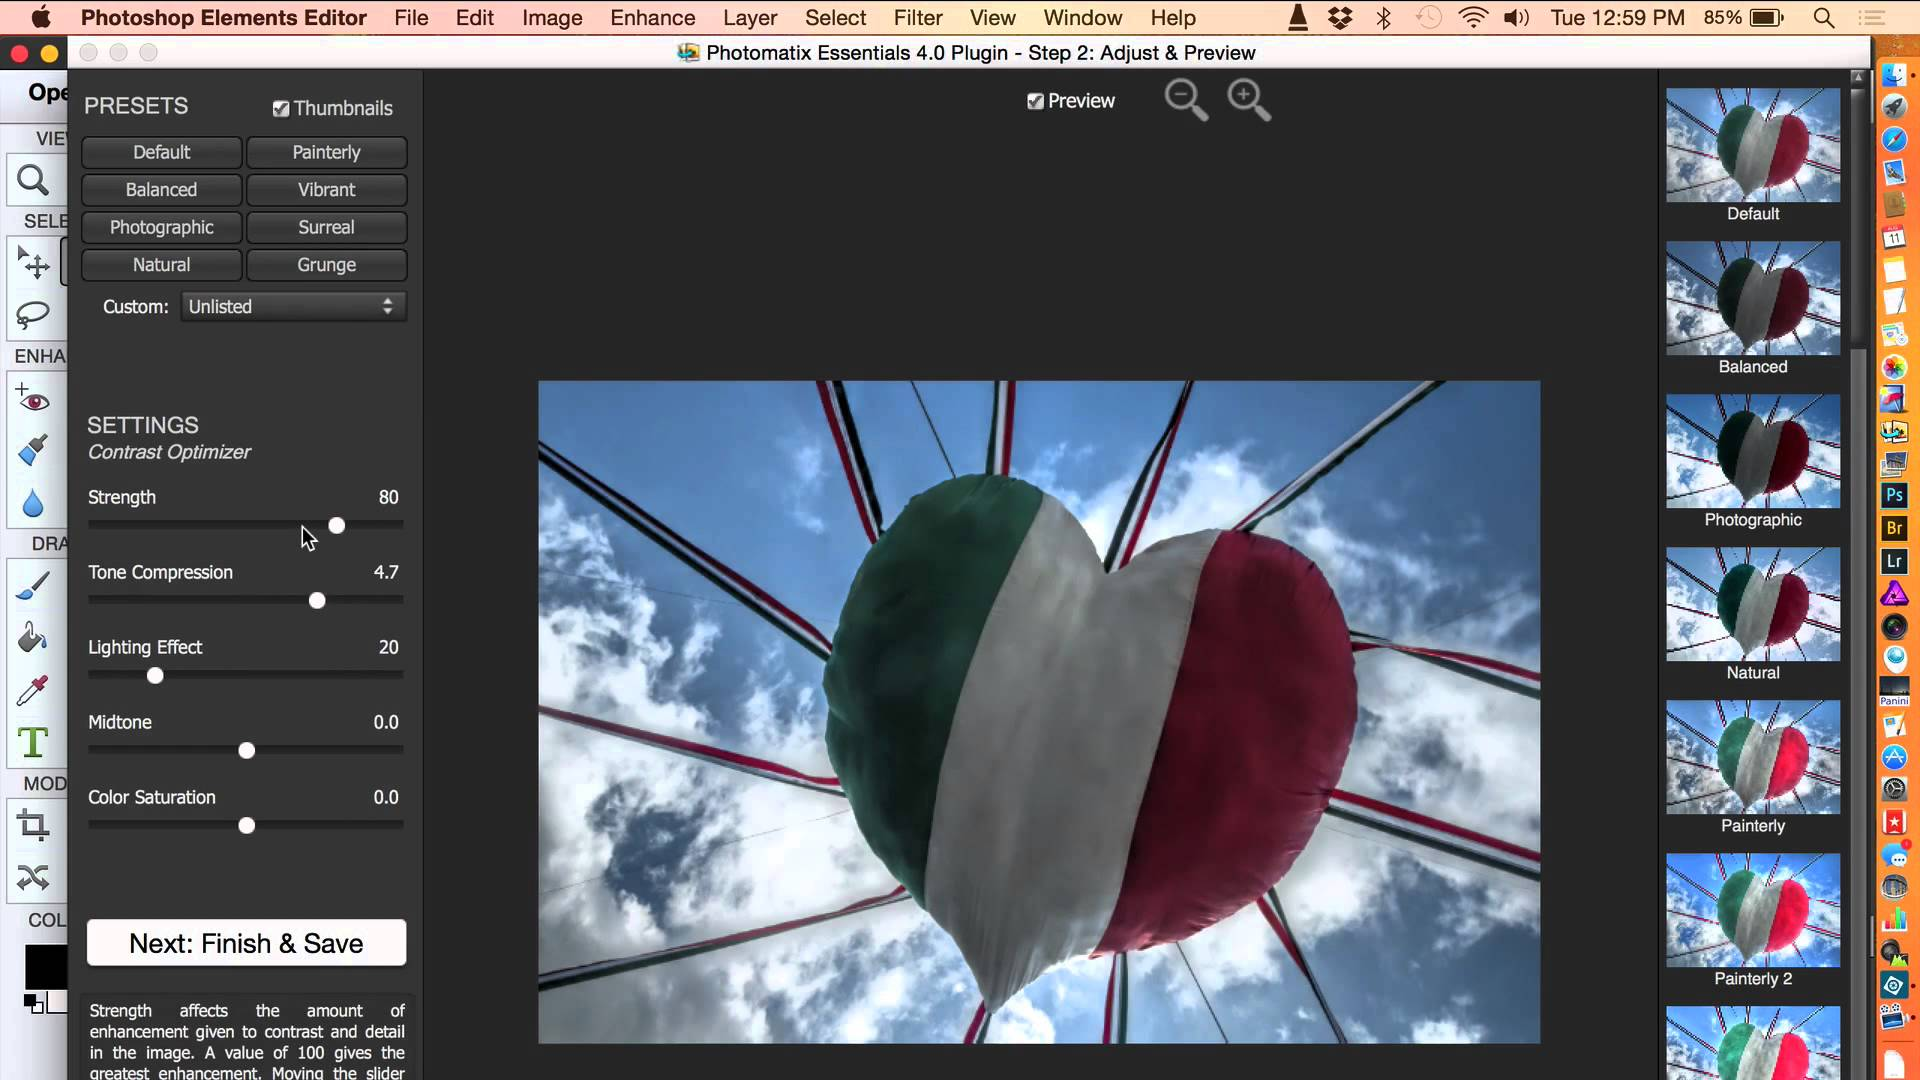 Photomatix Essentials for Photoshop Elements